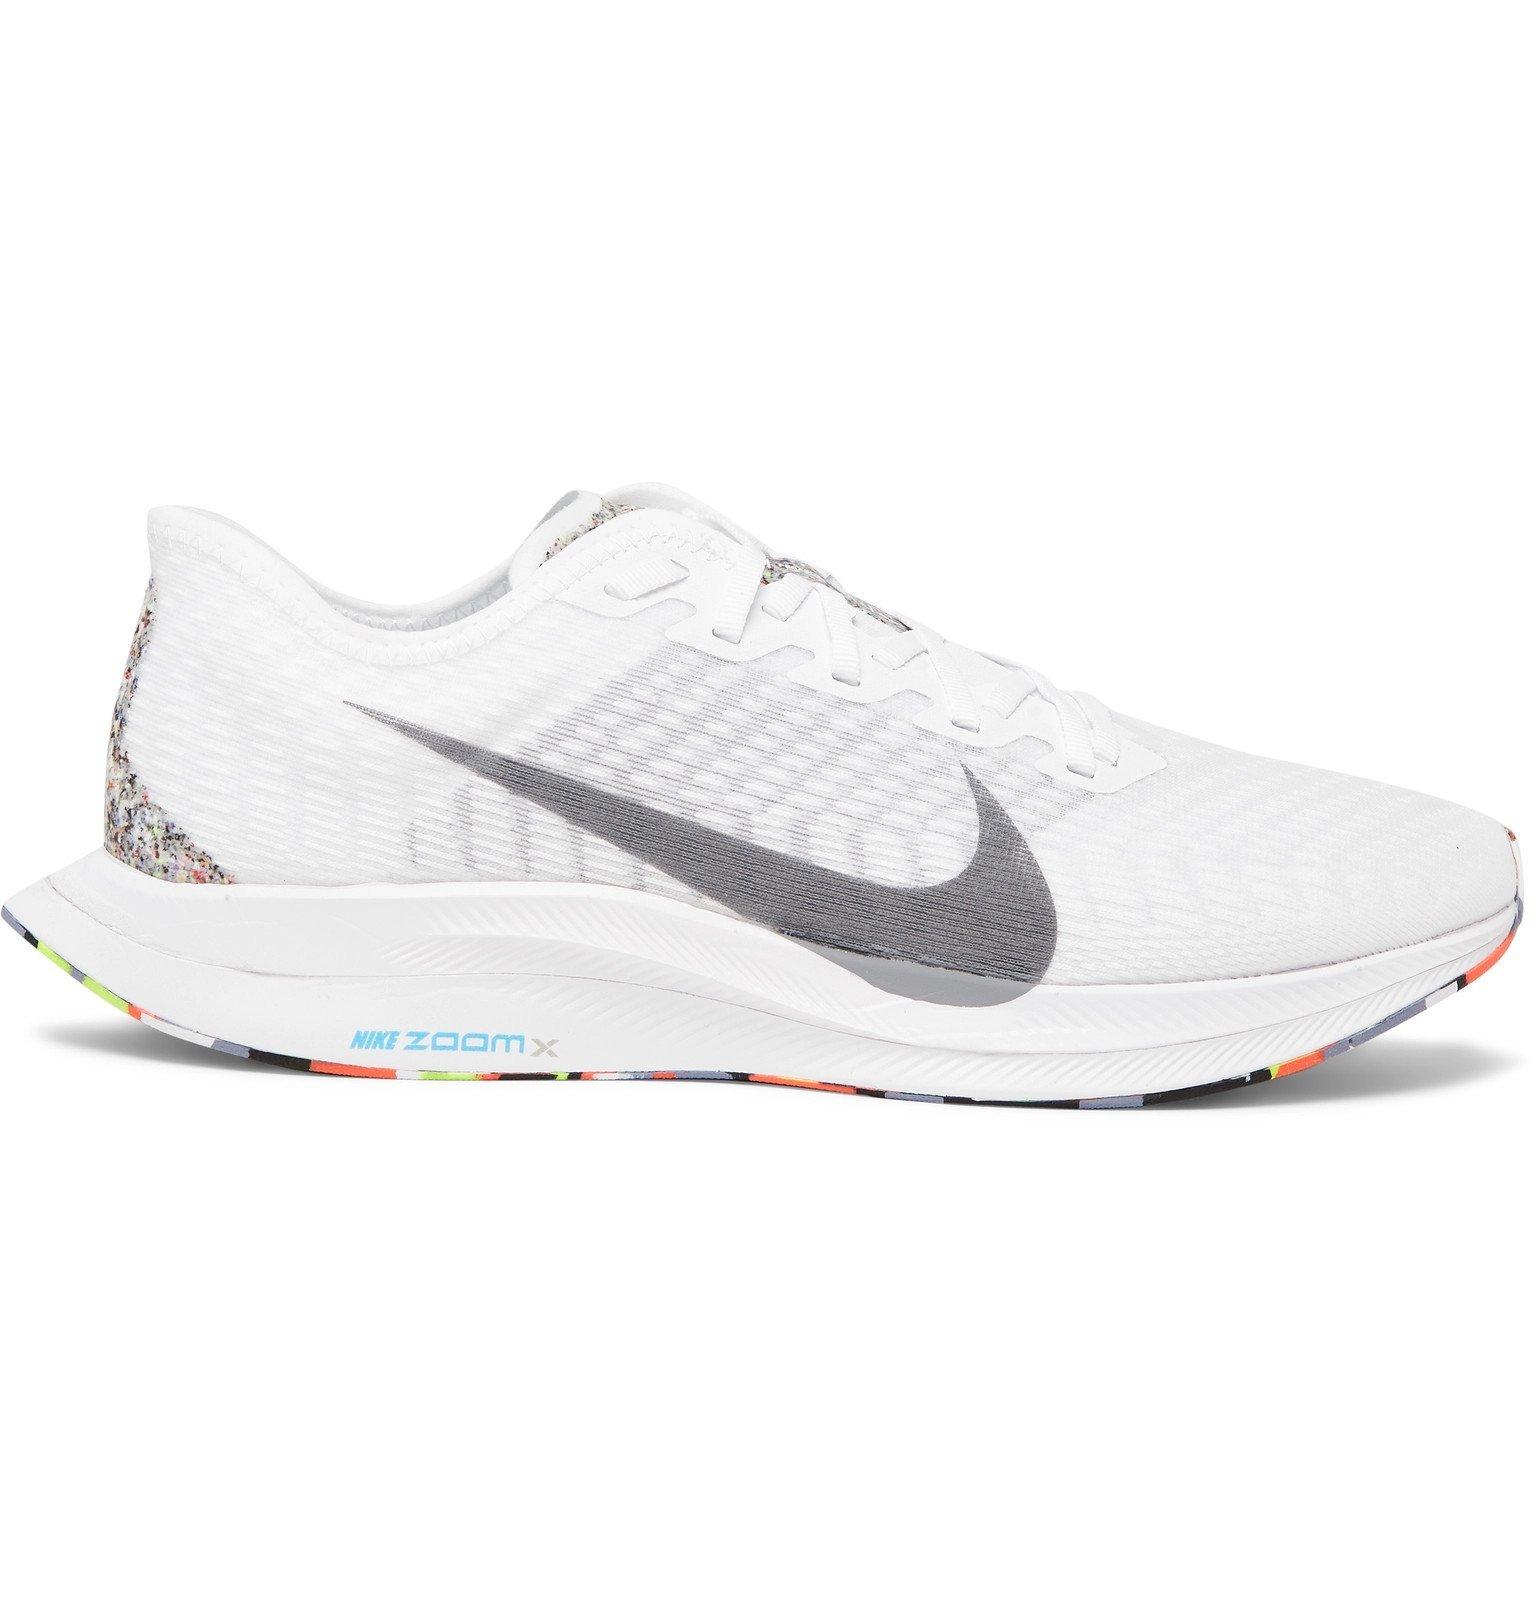 Nike Running - Zoom Pegasus Turbo 2 Mesh Sneakers - White